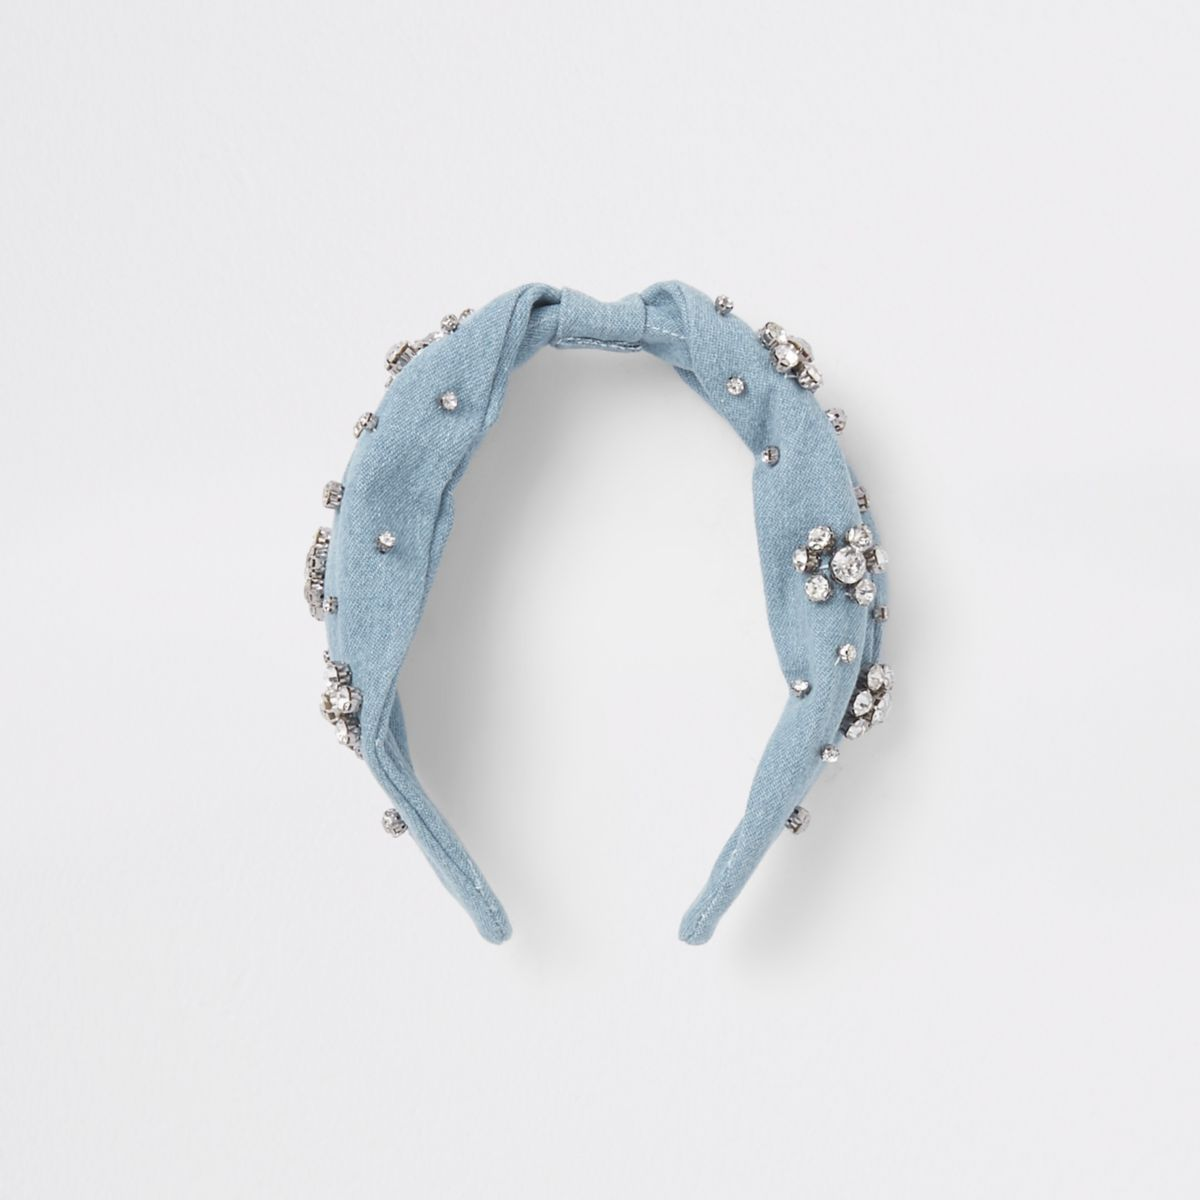 Blue denim diamante embellished headband